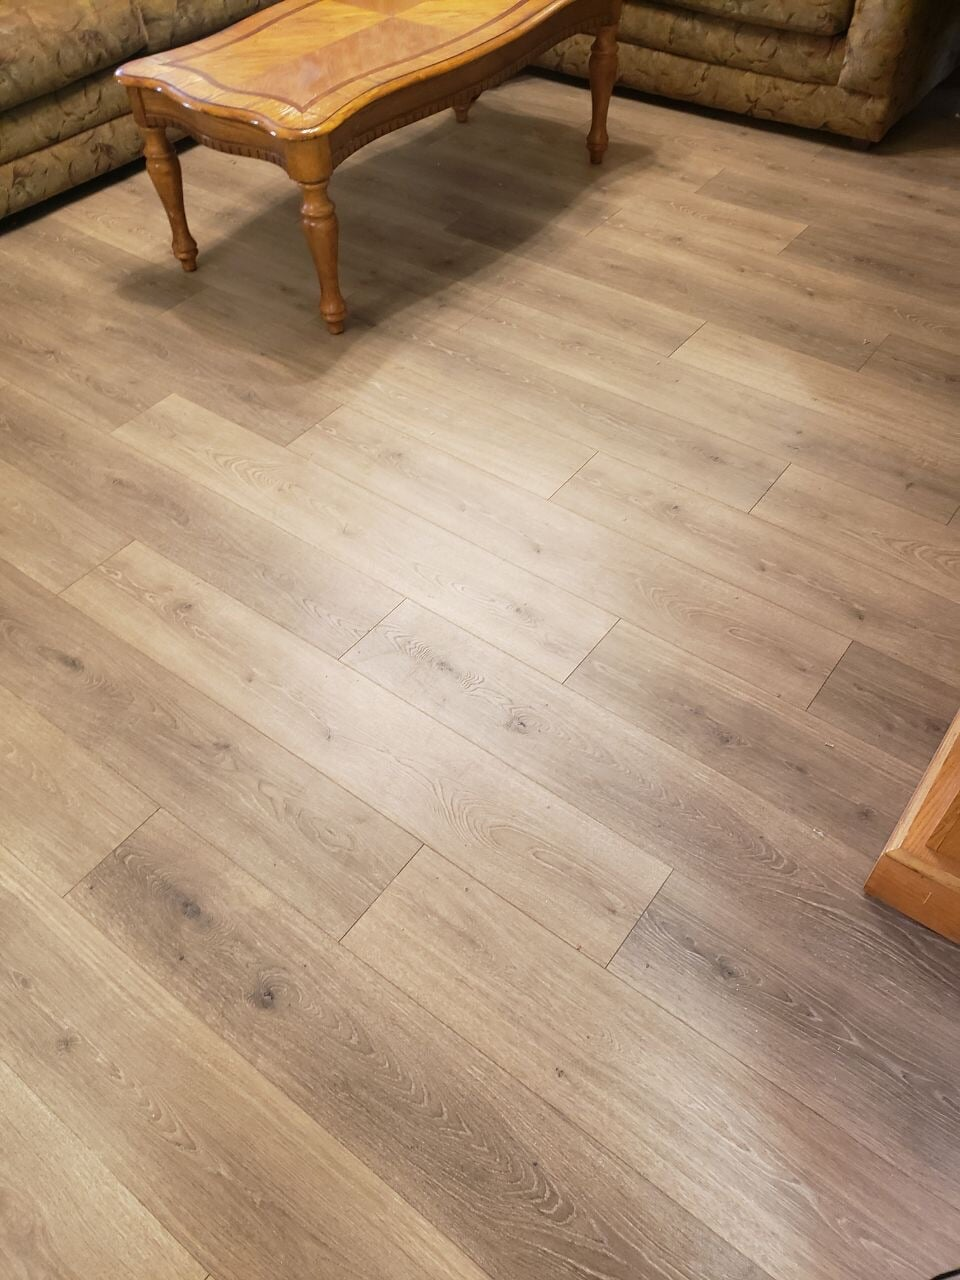 Light tone hardwood flooring in Lebanon, TN from Absolute Flooring Inc